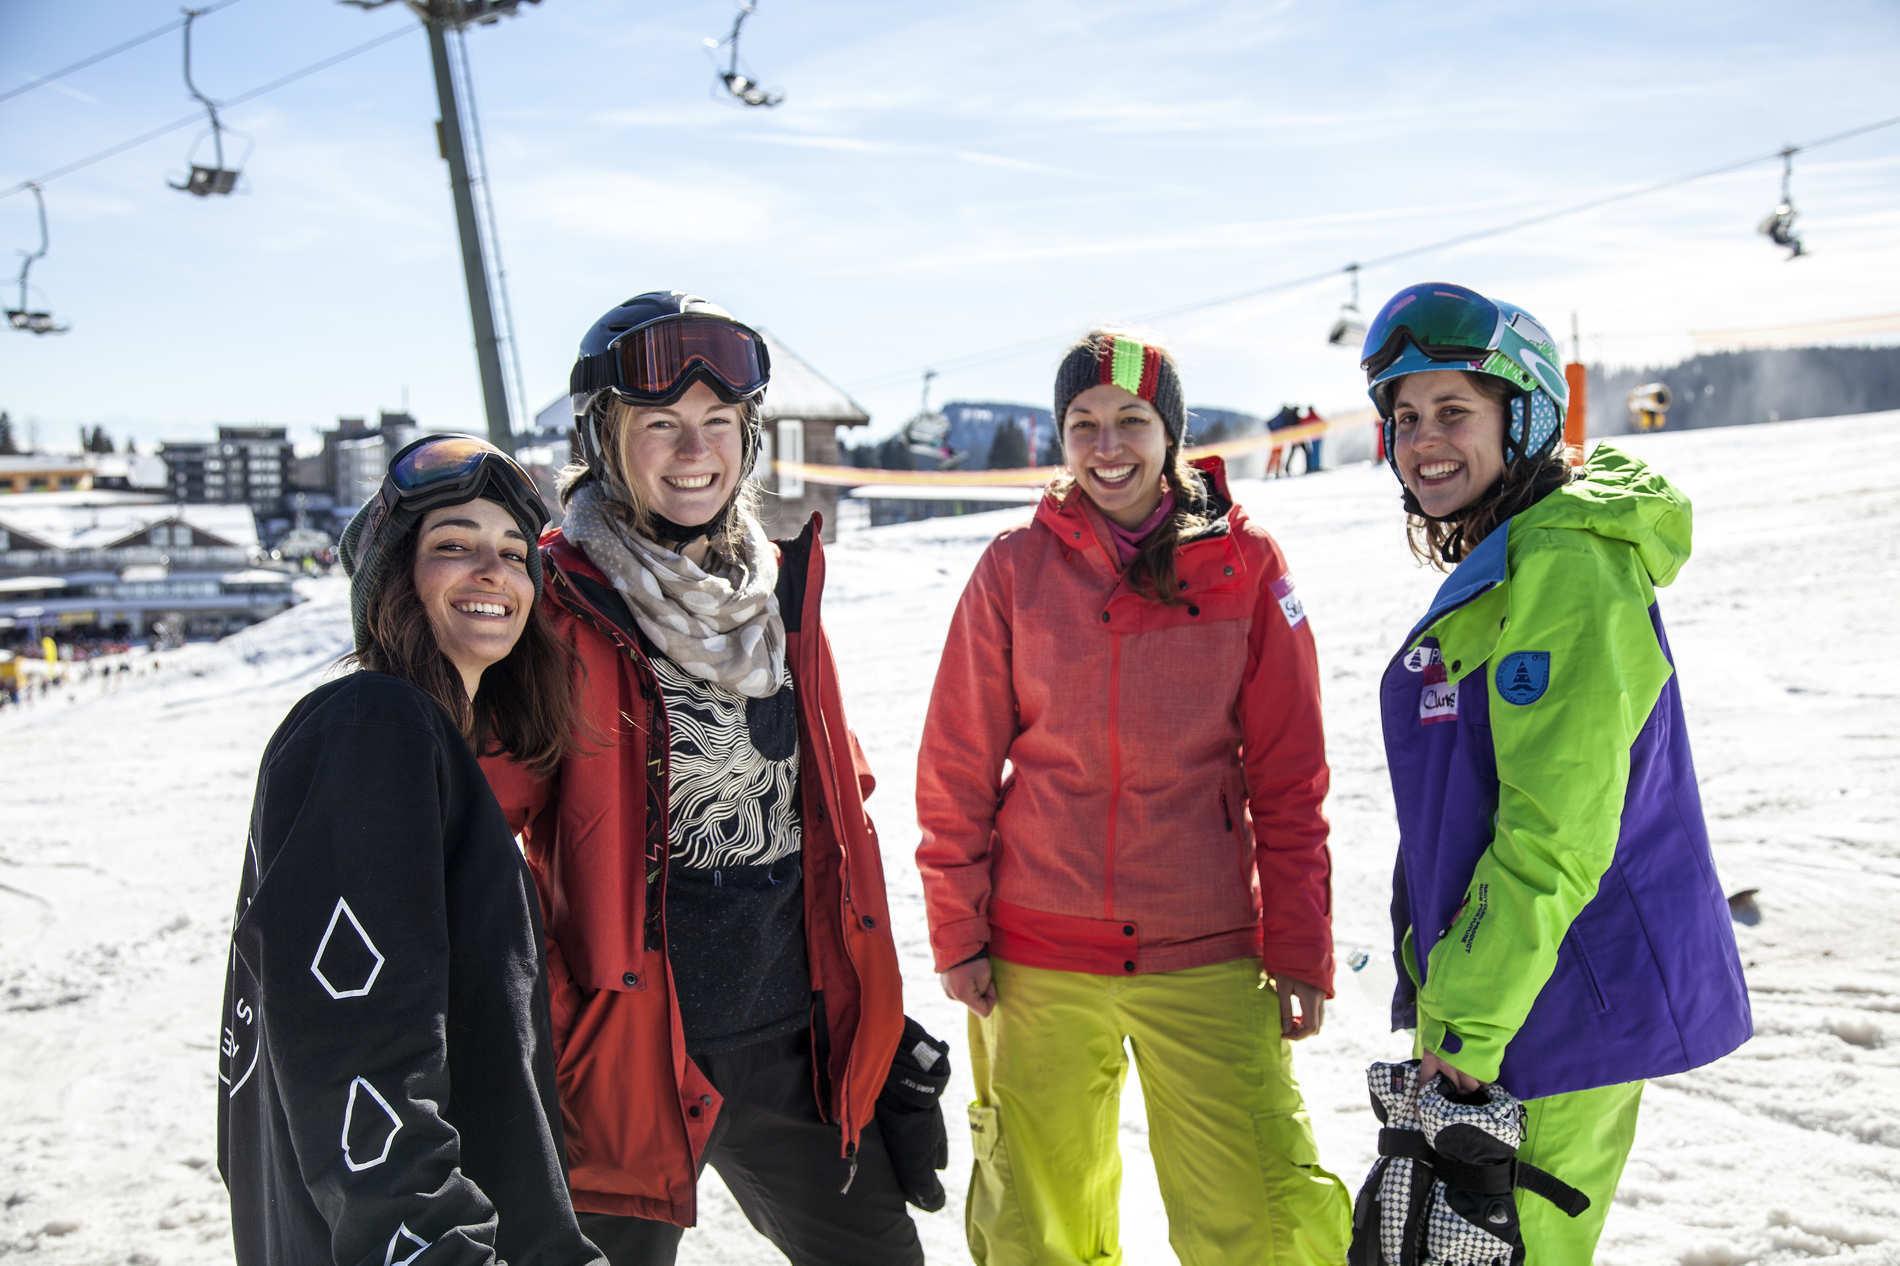 web snowpark feldberg 25 02 2017 lifestyle fs sb martin herrmann qparks 6